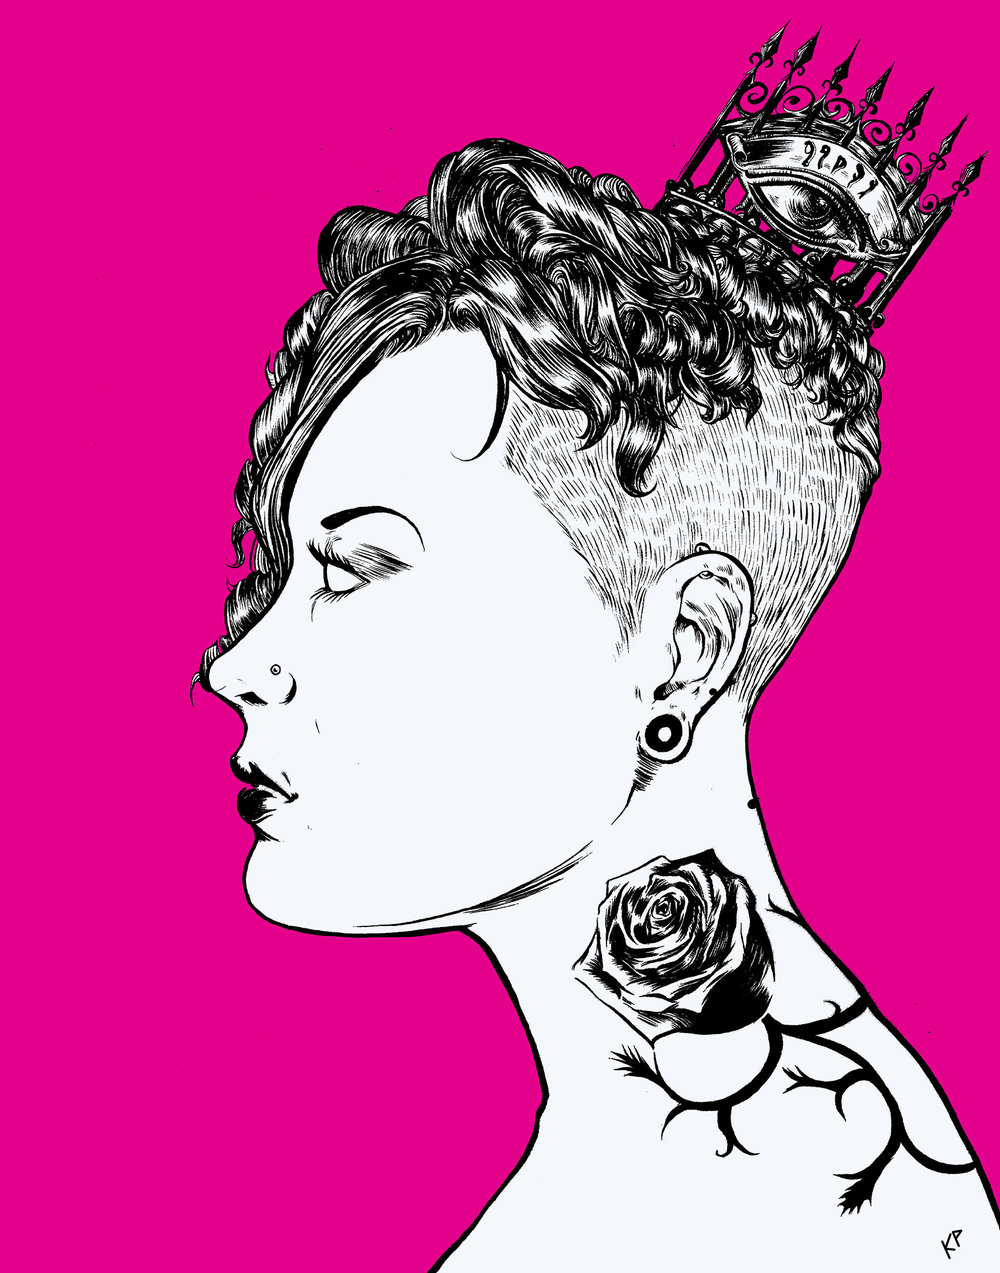 rose-punk_200.jpg